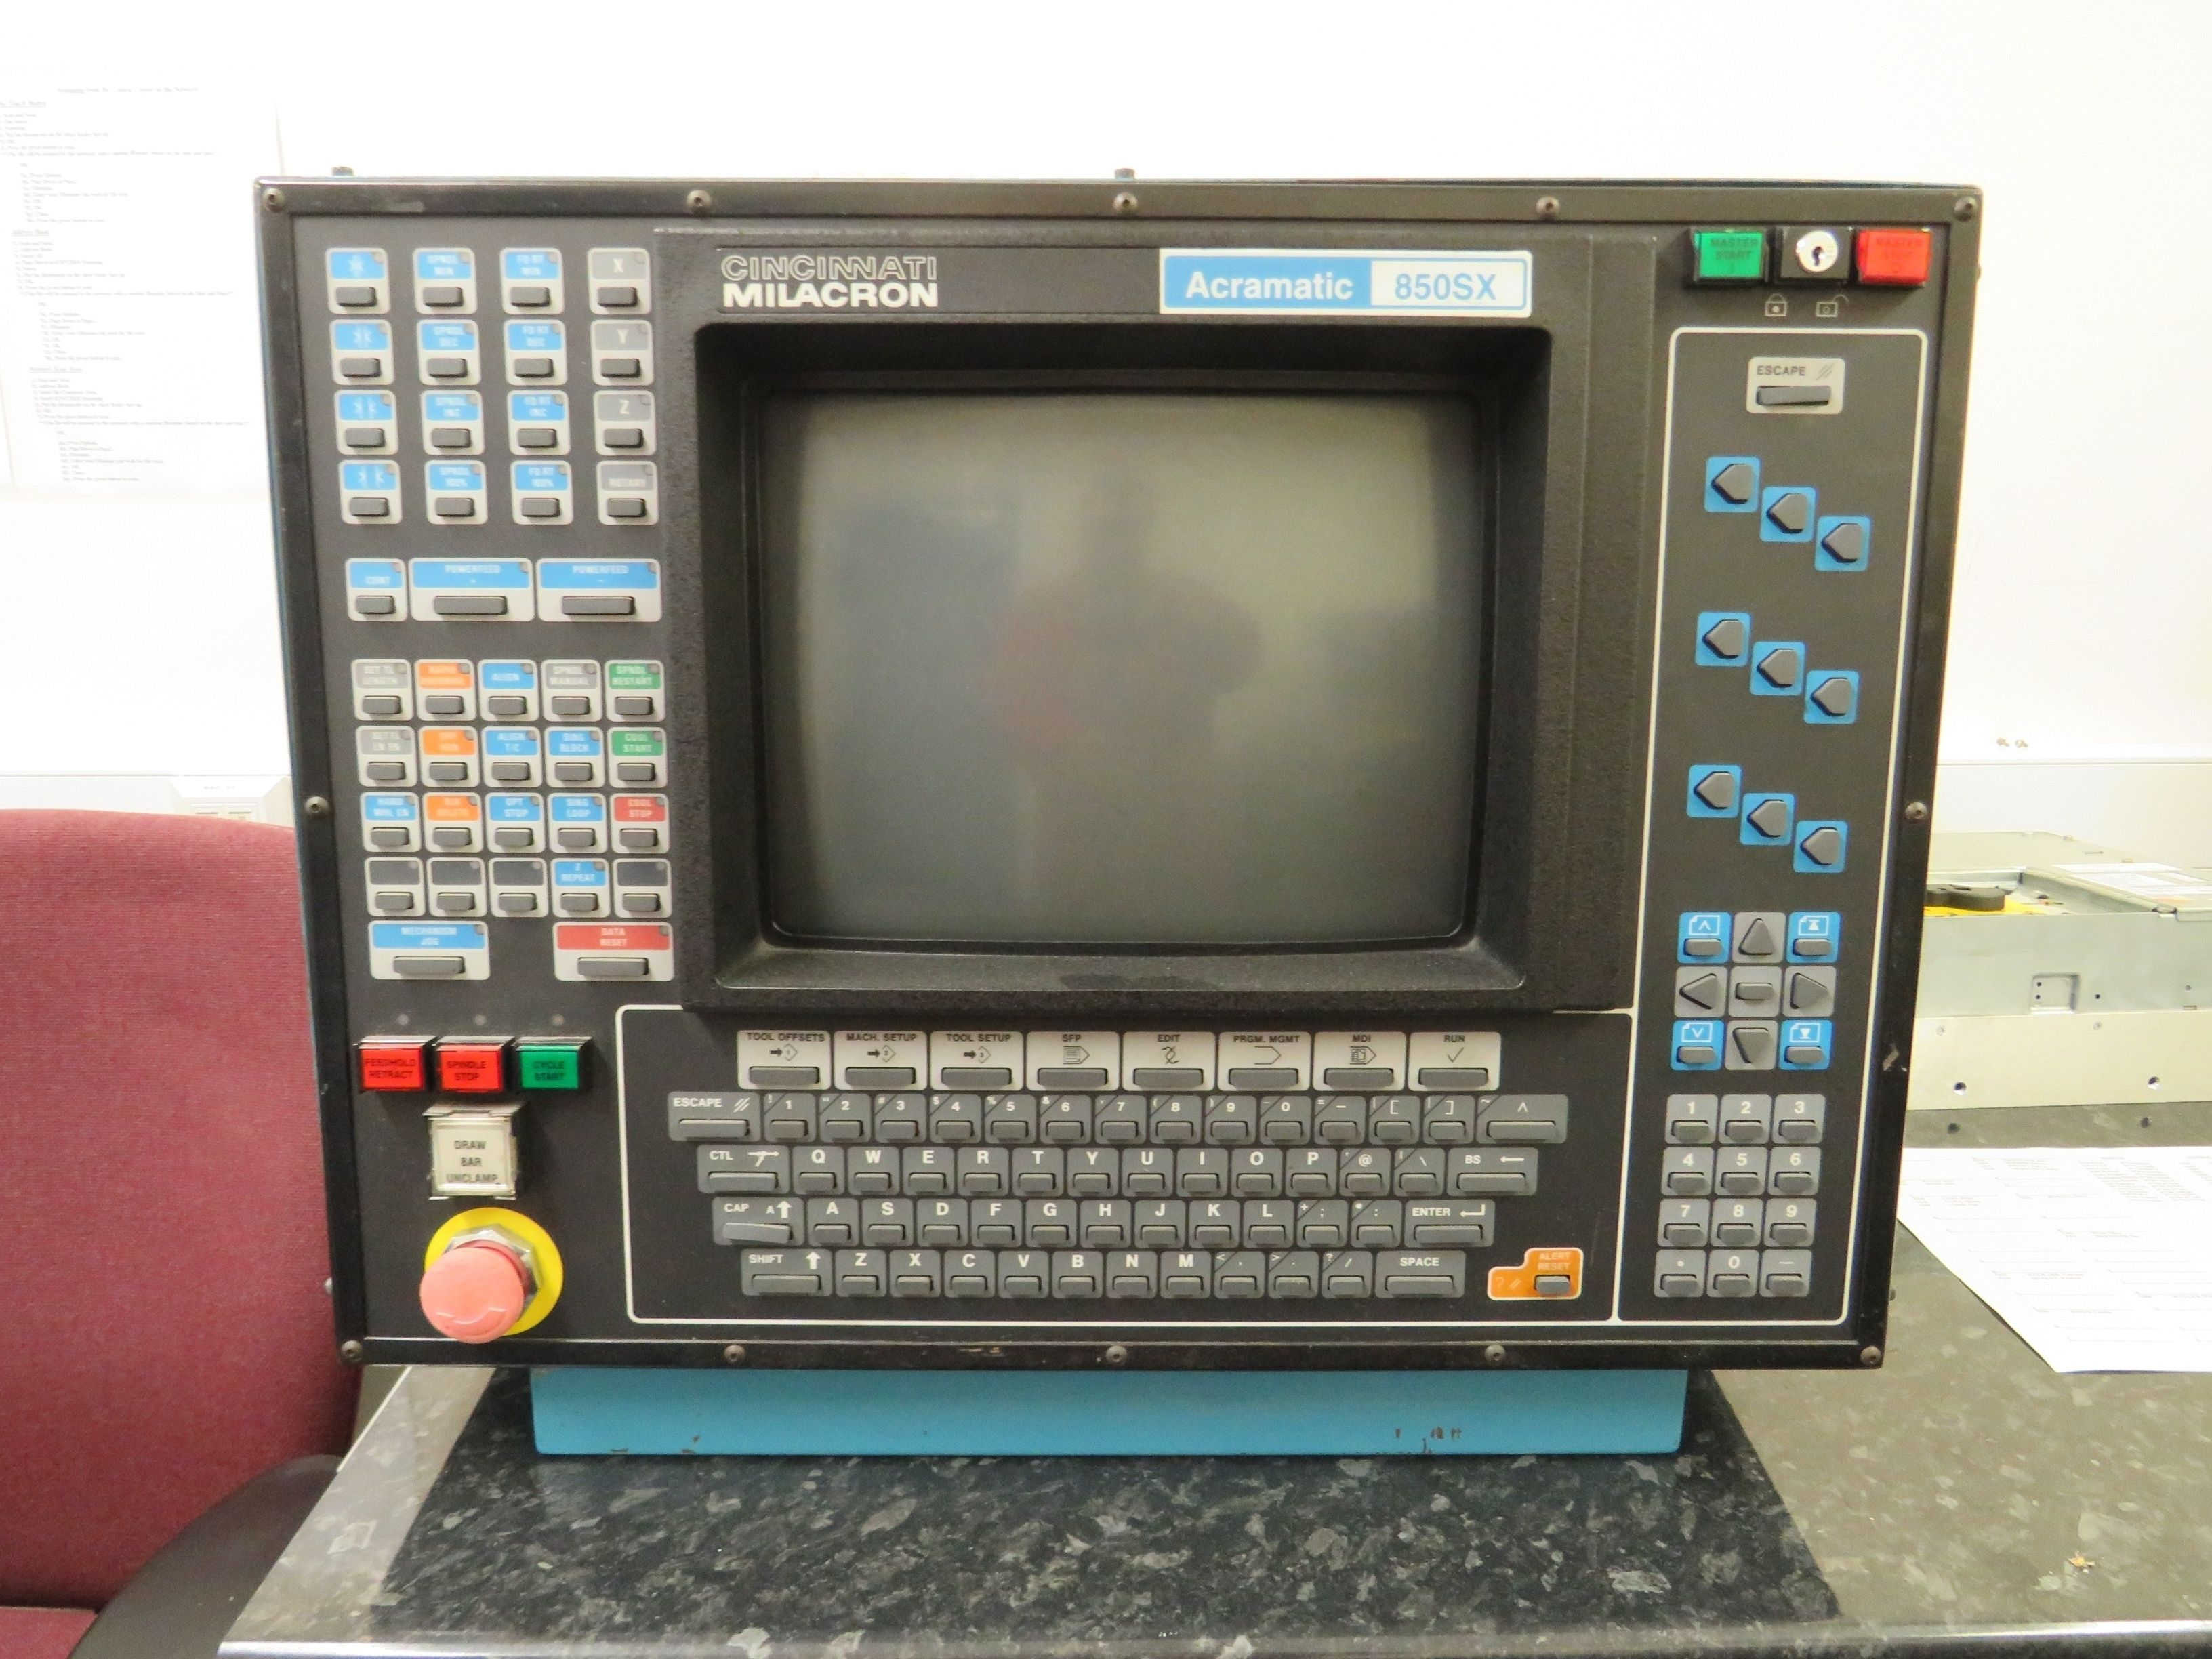 Cinncinati Milacron Acramatic 850SX Trainingssteuerung